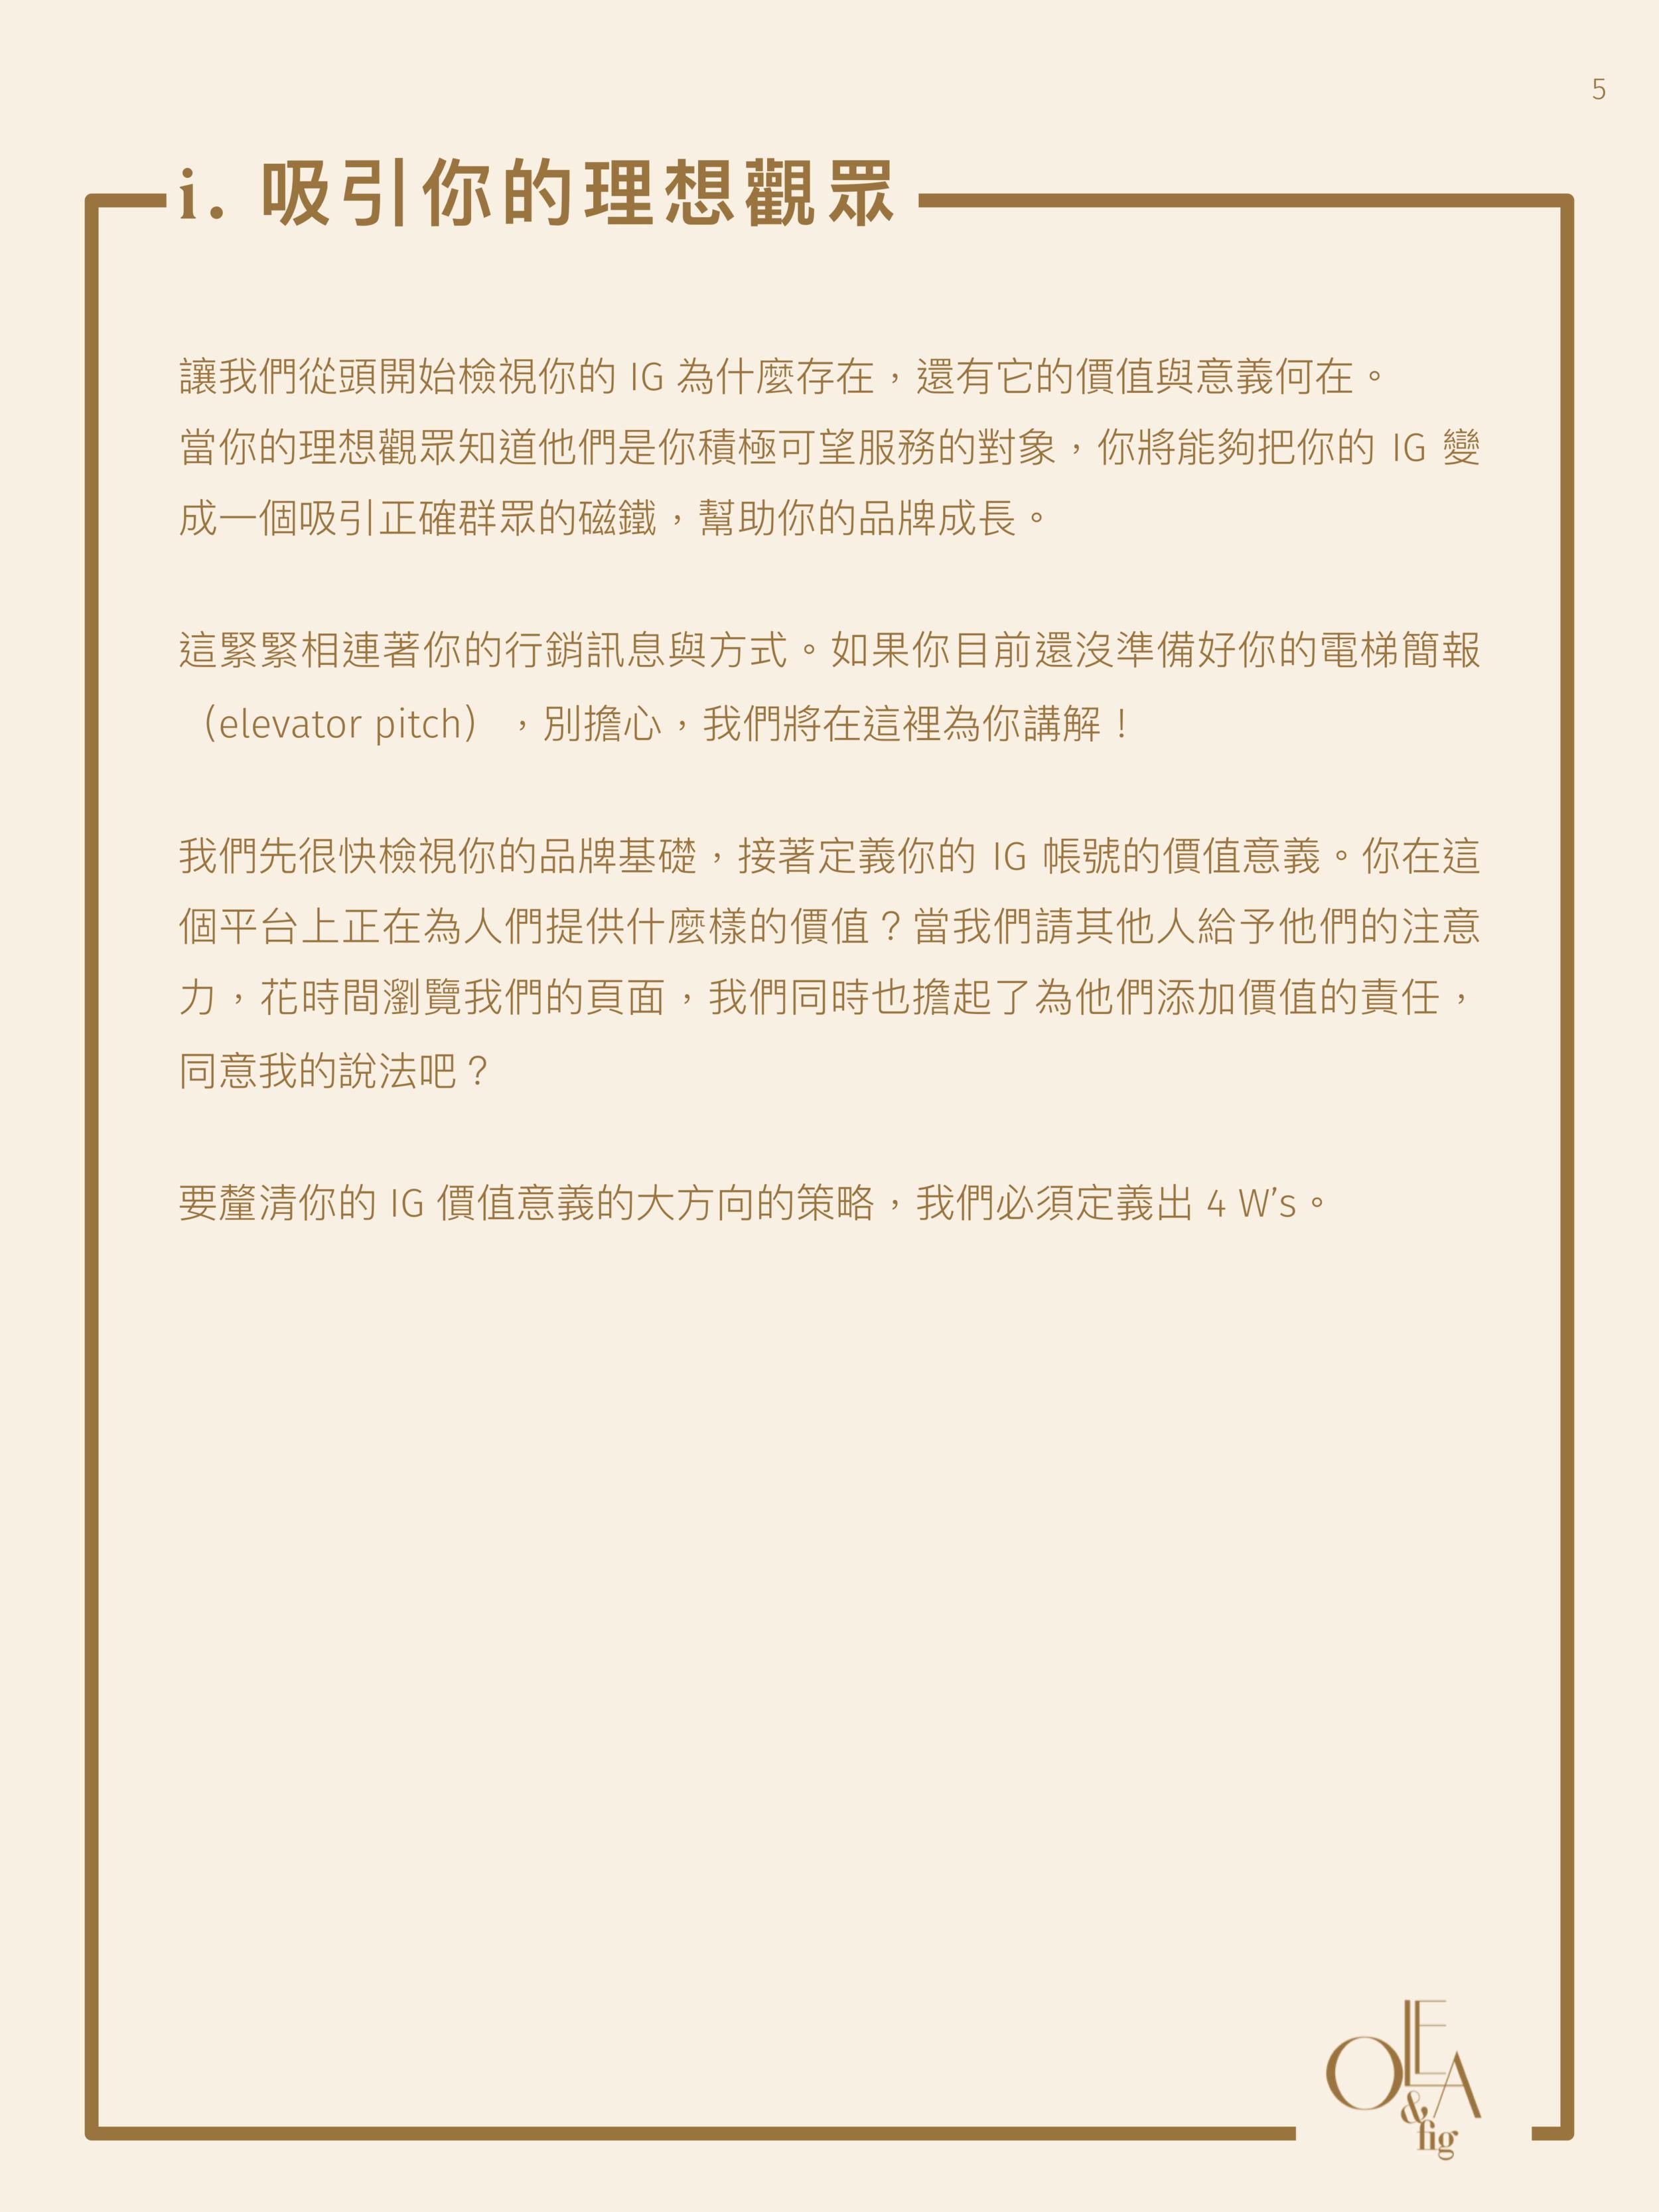 [Olea & FIg] IG終極指南手冊 copy 4.png